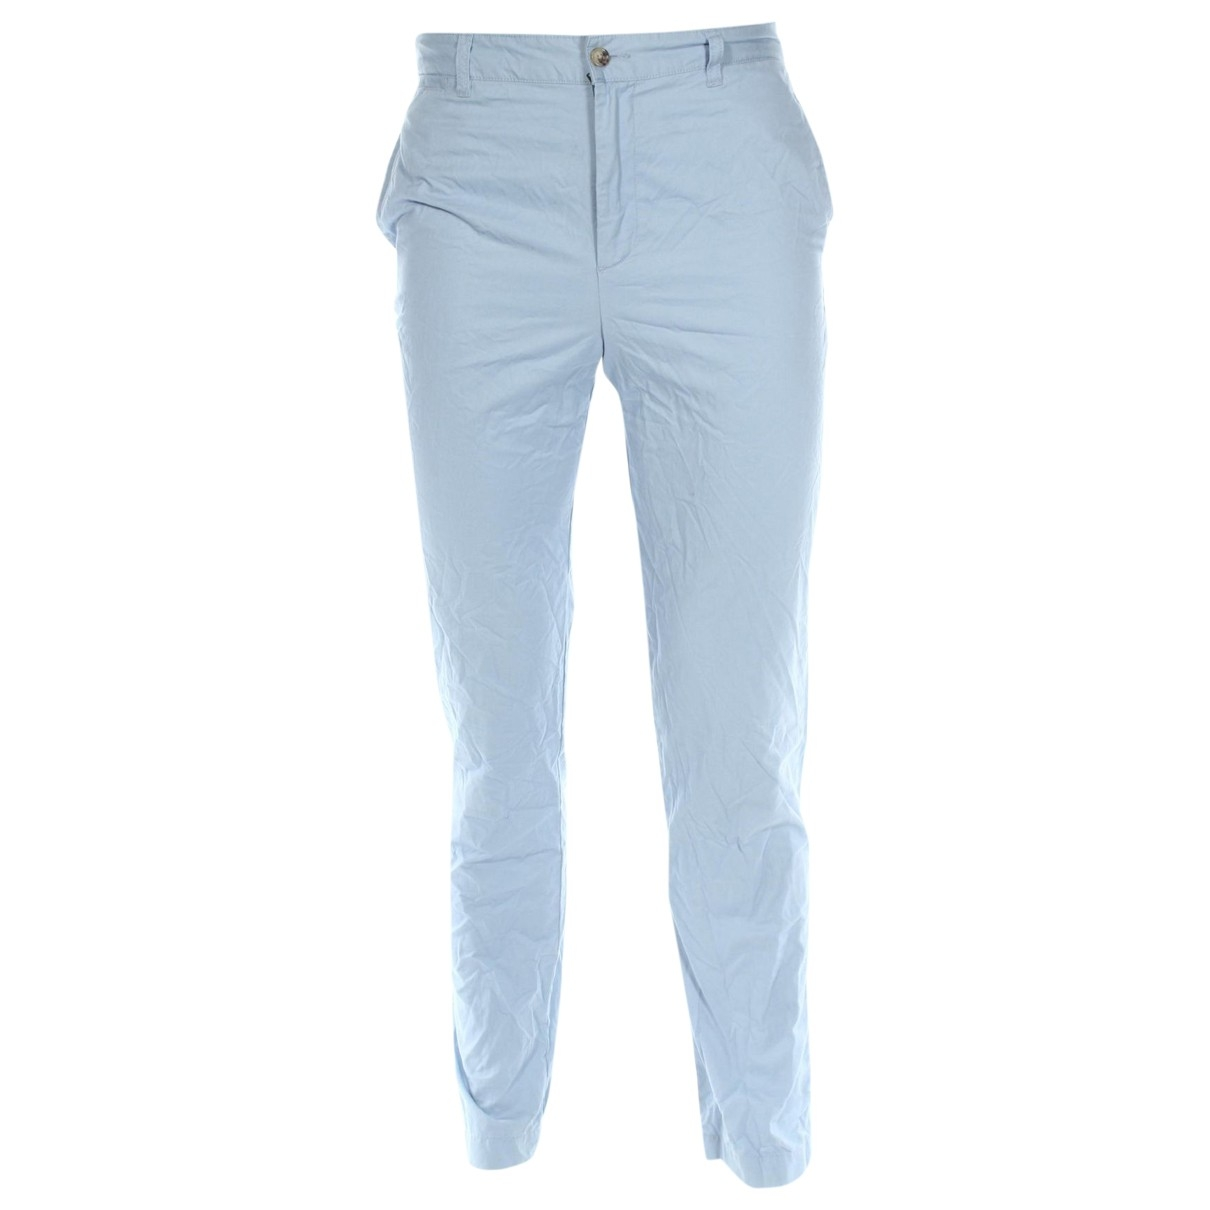 Polo Ralph Lauren \N Blue Cotton Trousers for Men S International